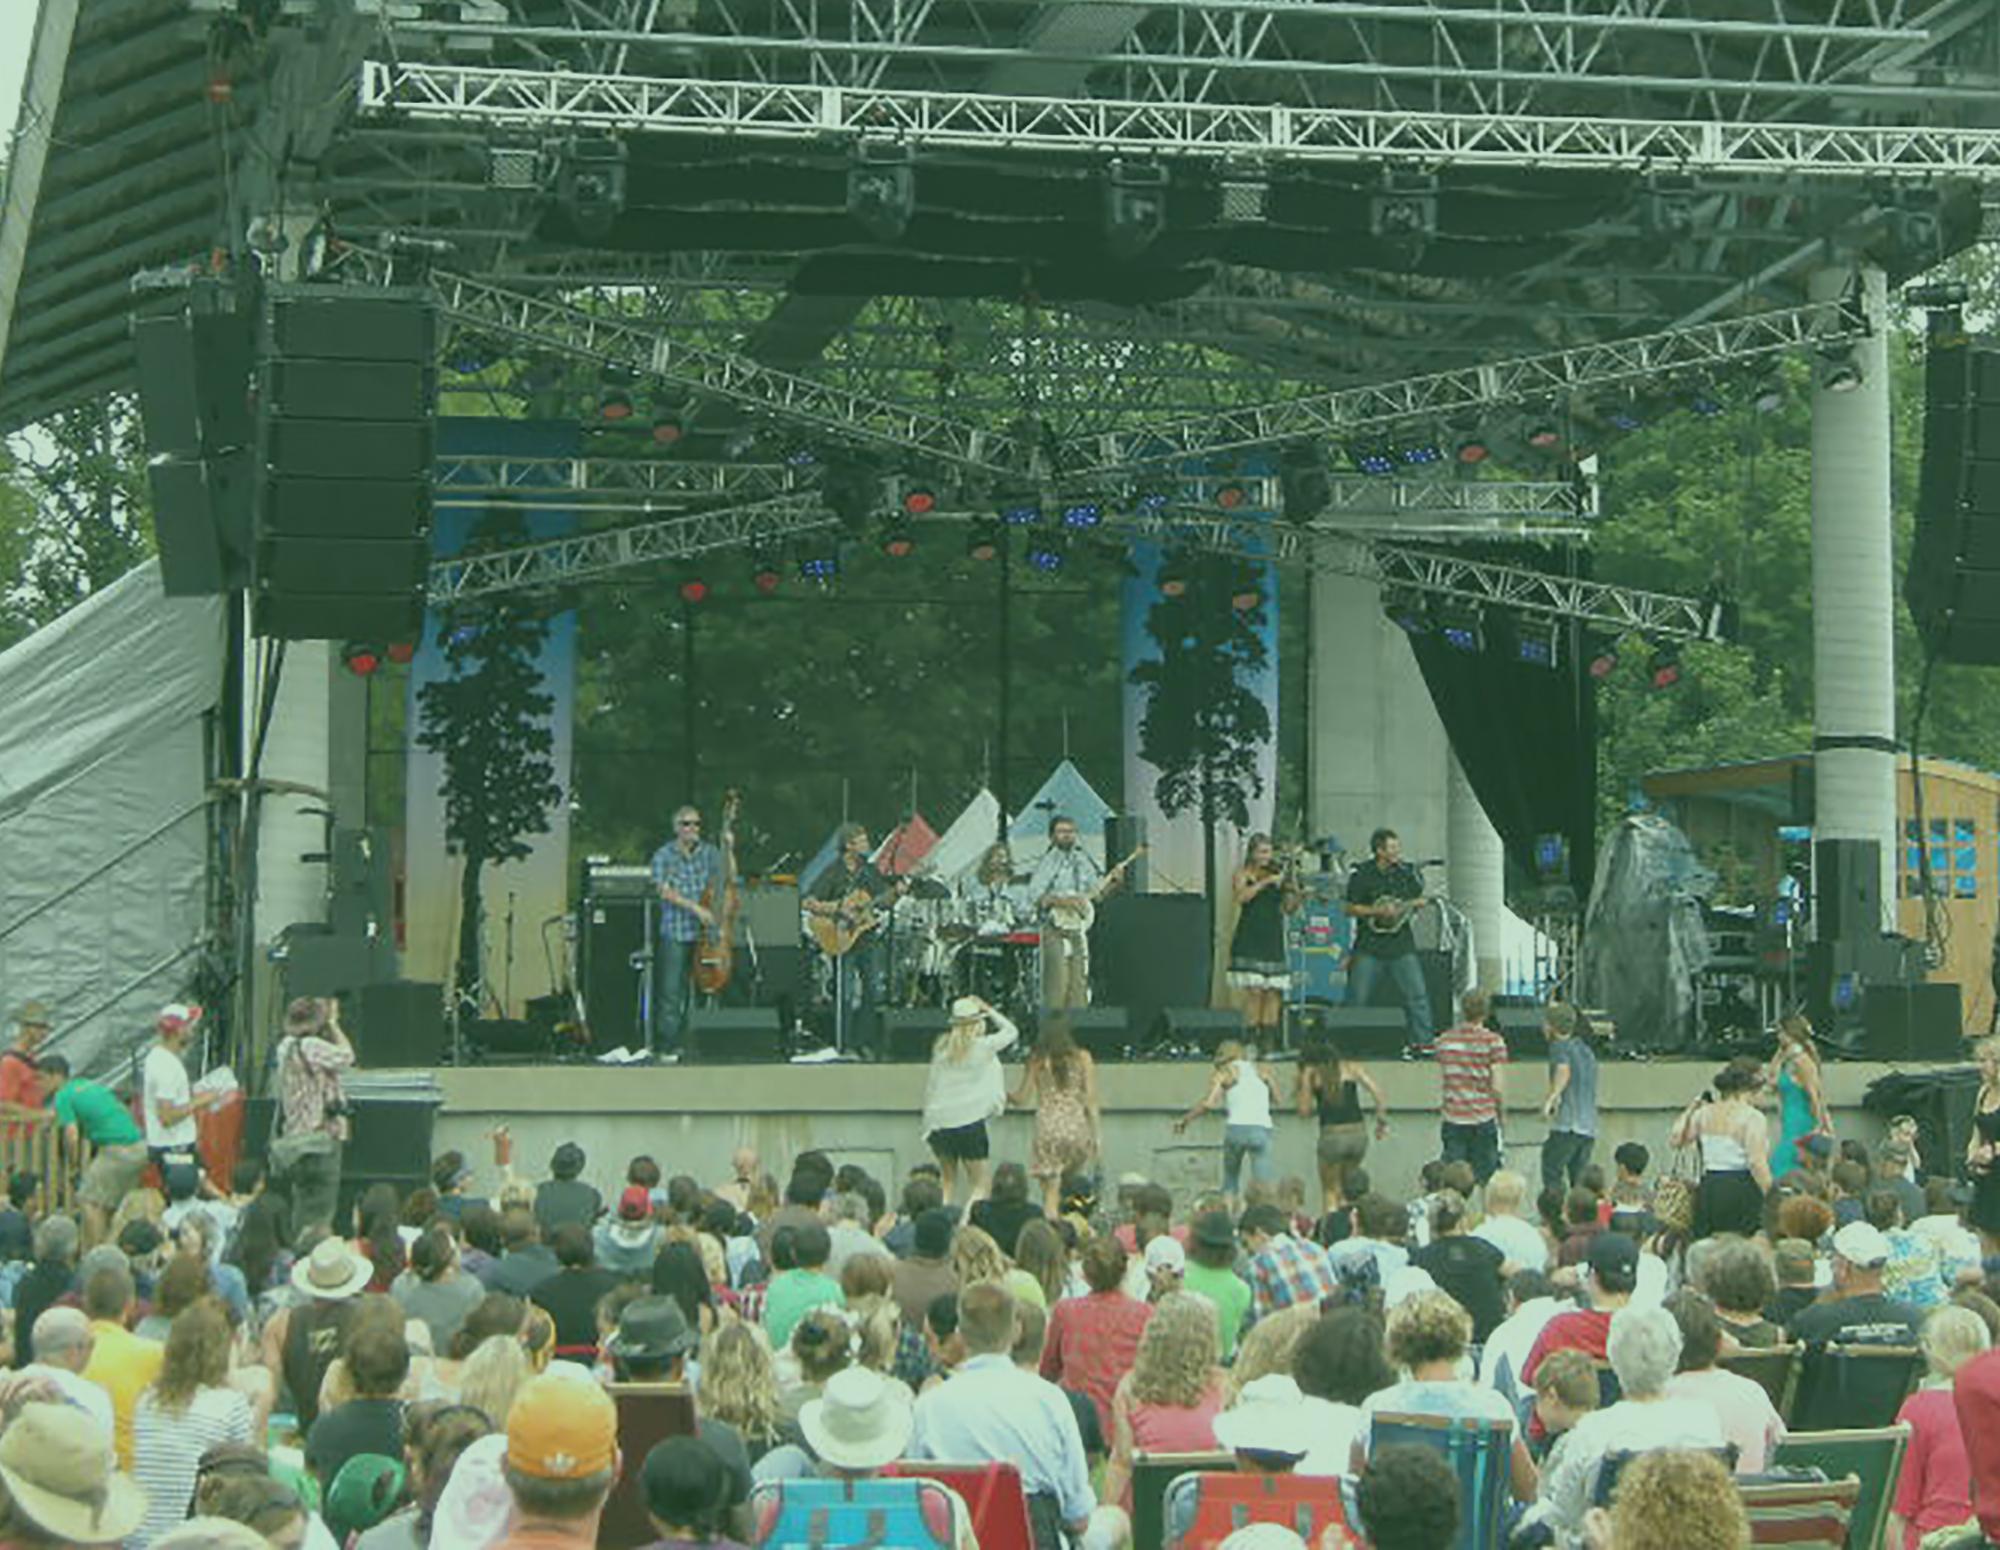 EASE Customer Service Training: Music Festivals